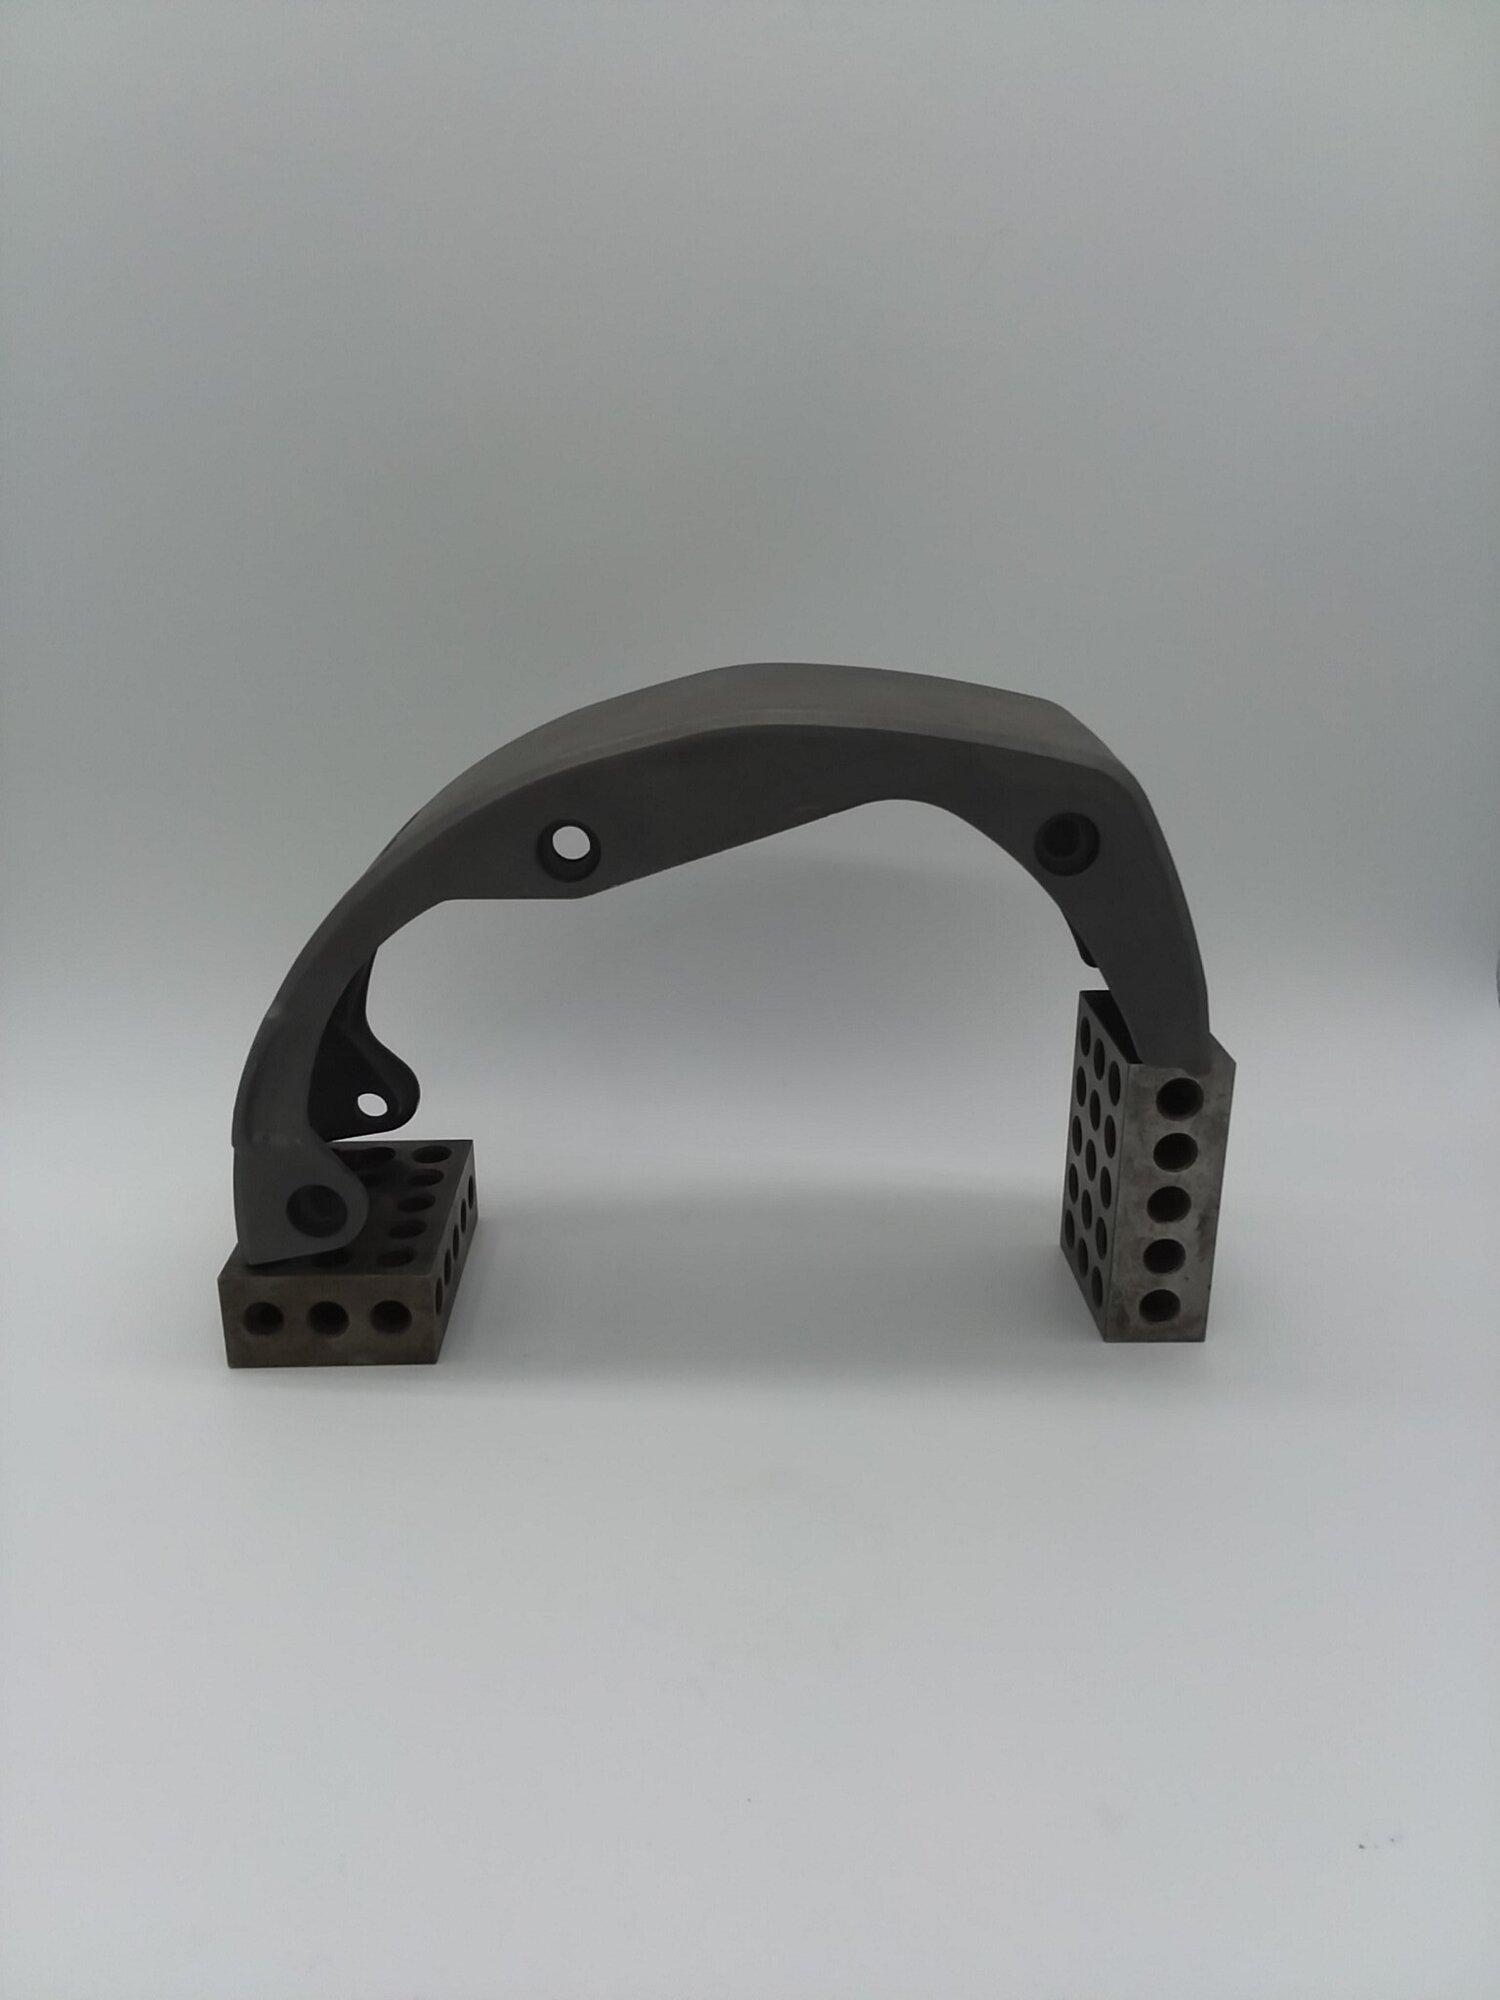 www.bikefabsupply.com